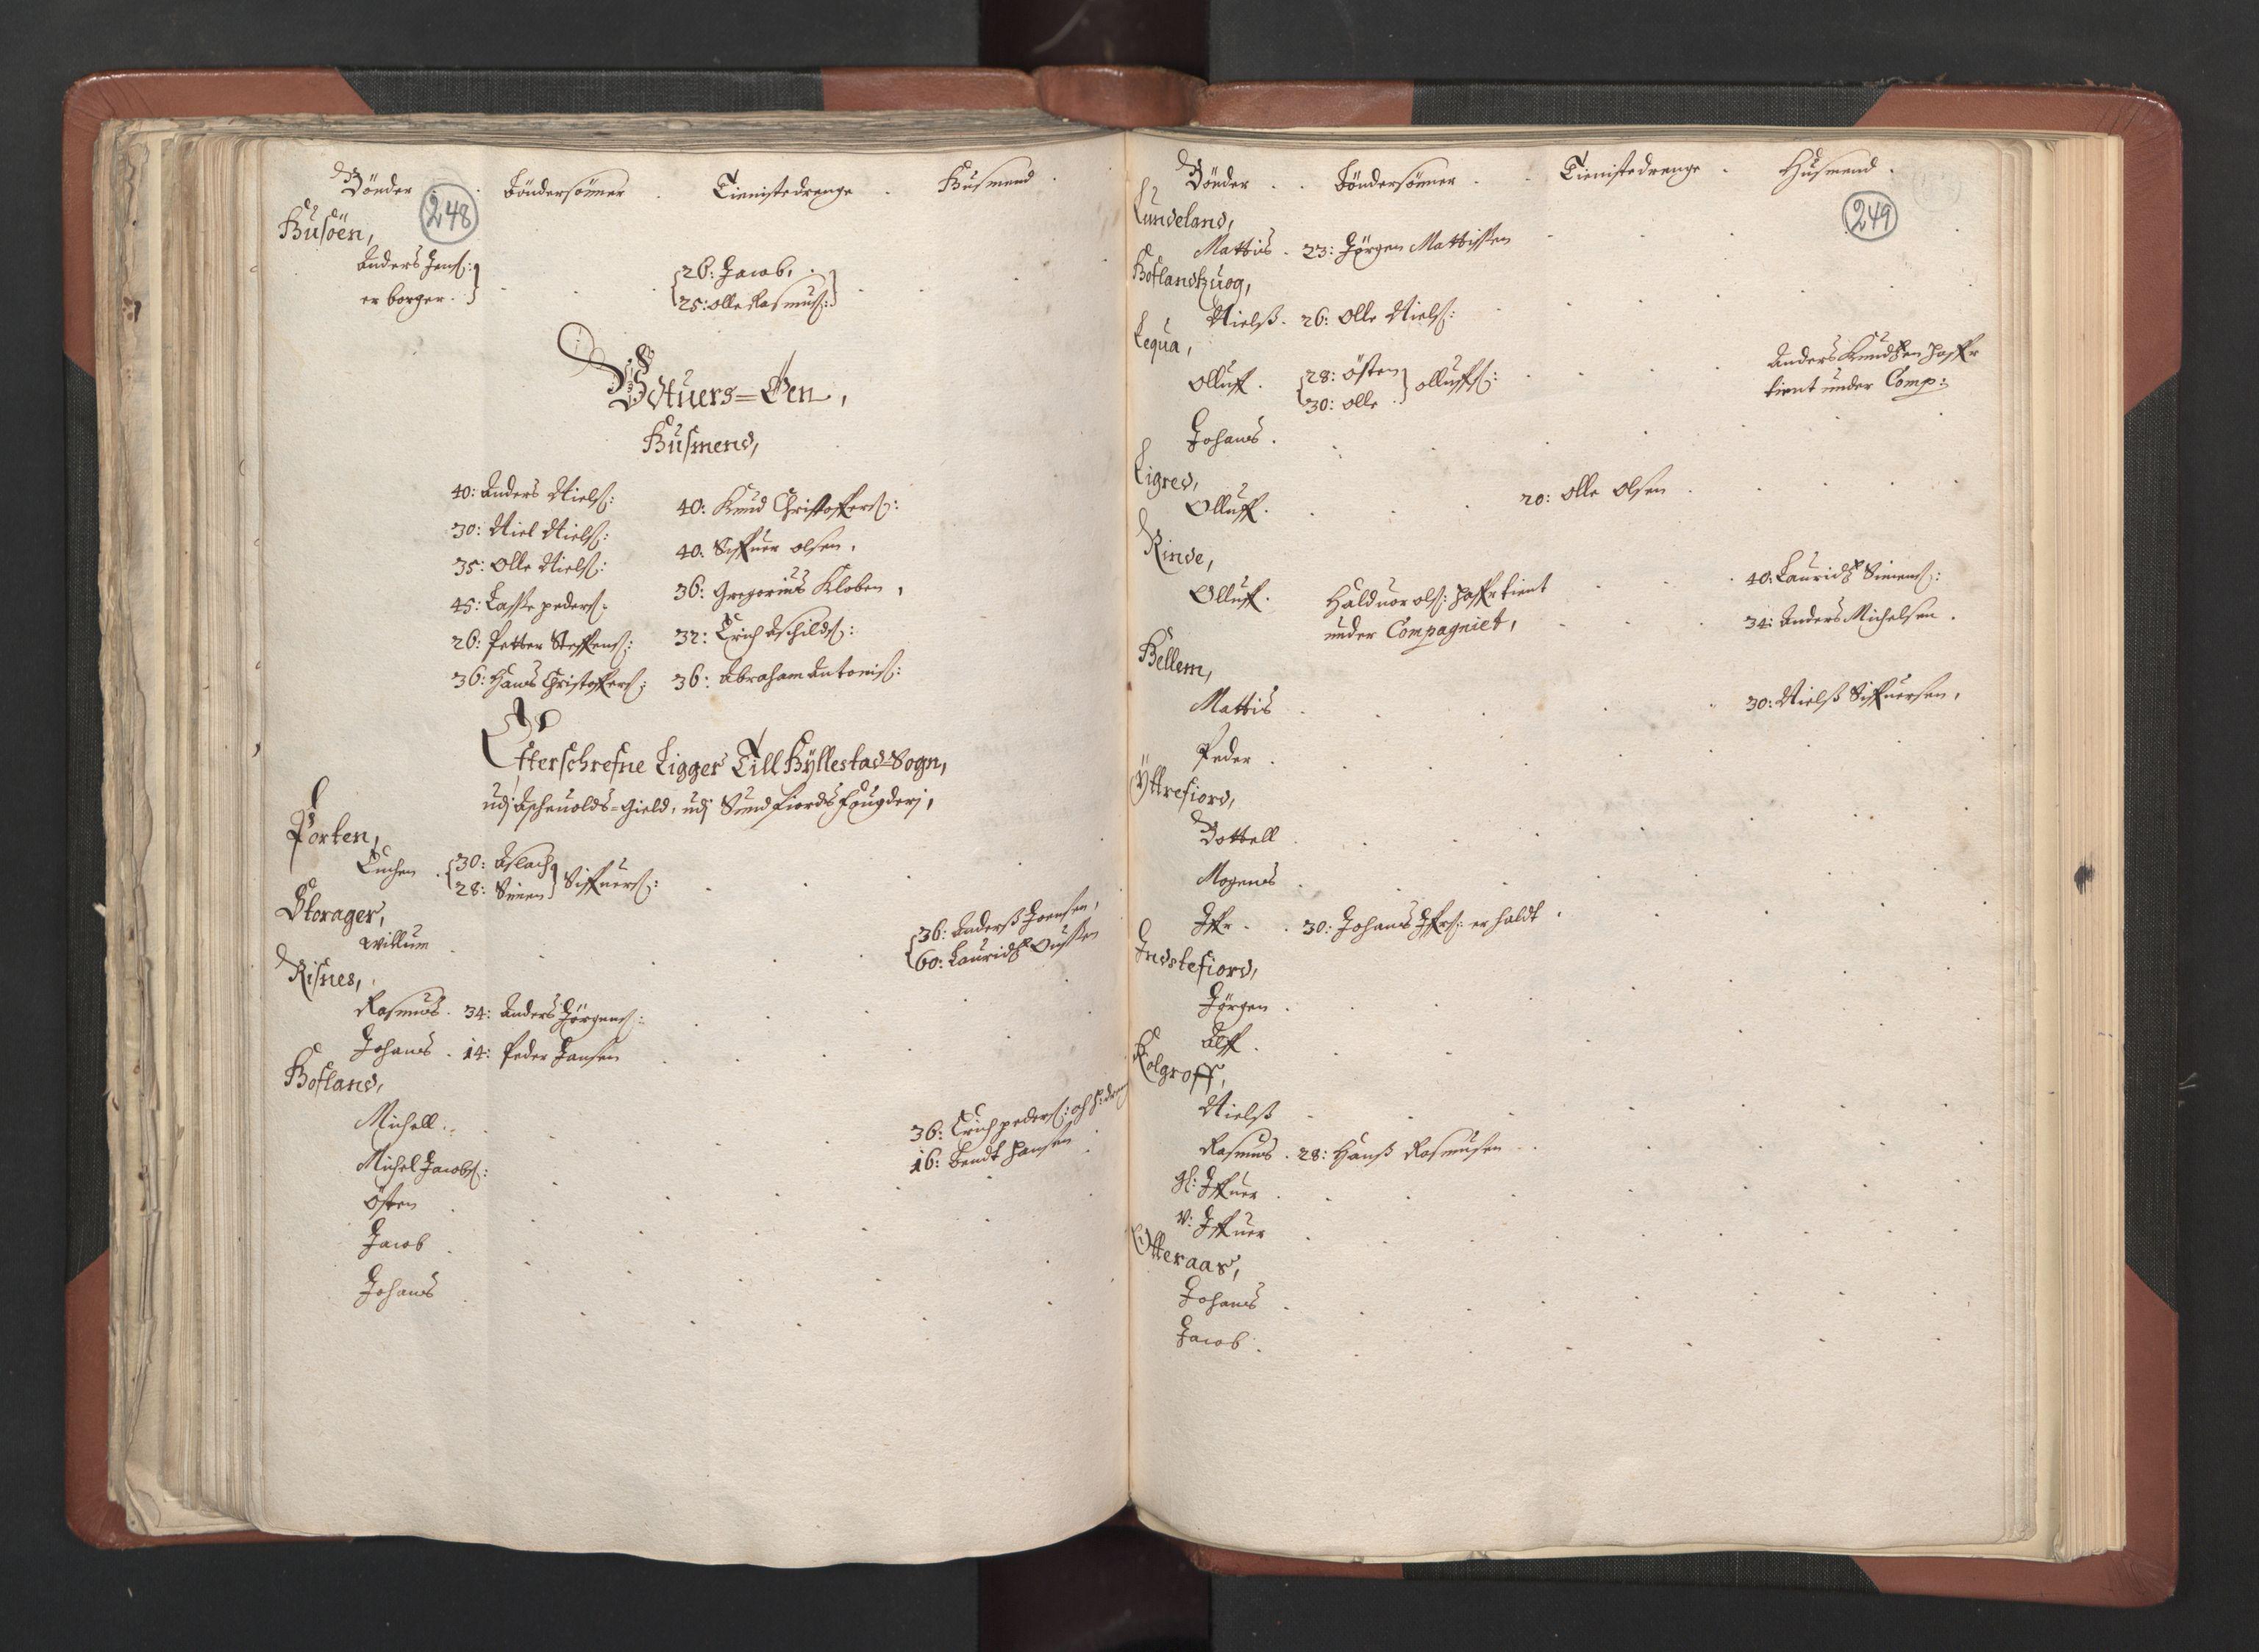 RA, Fogdenes og sorenskrivernes manntall 1664-1666, nr. 14: Hardanger len, Ytre Sogn fogderi og Indre Sogn fogderi, 1664-1665, s. 248-249